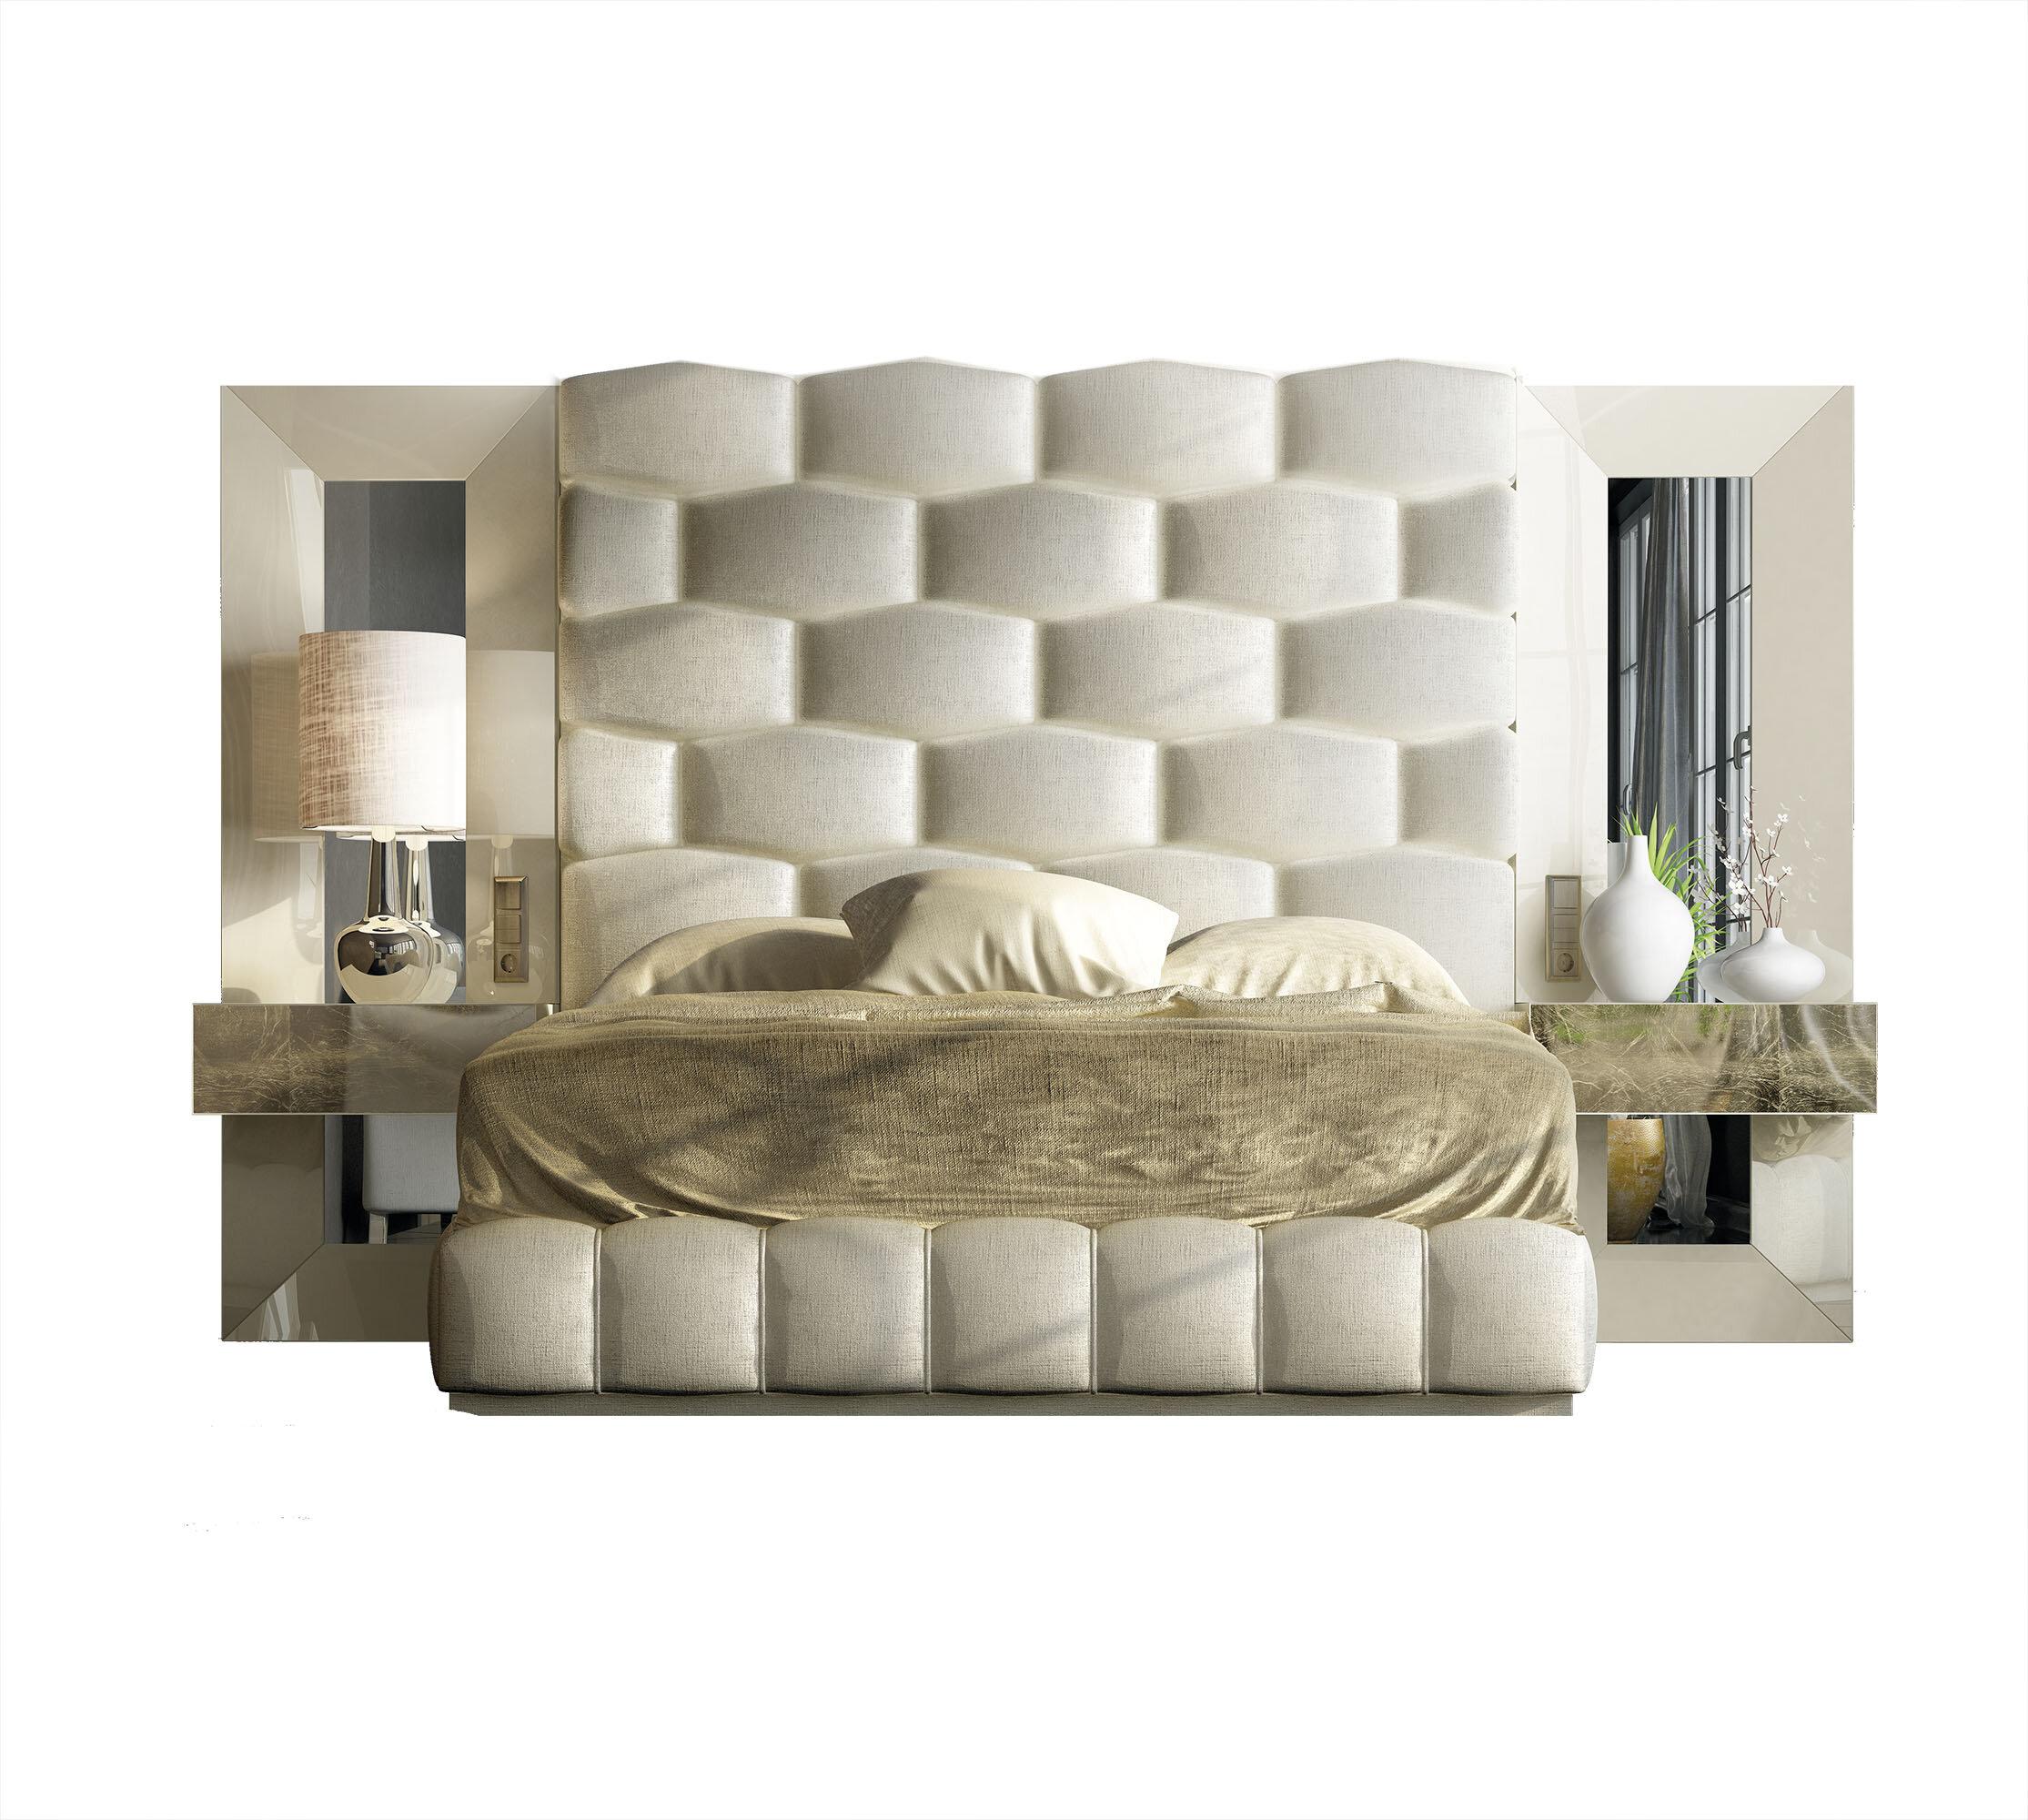 Everly Quinn Jerri King Platform 5 Piece Bedroom Set Wayfair